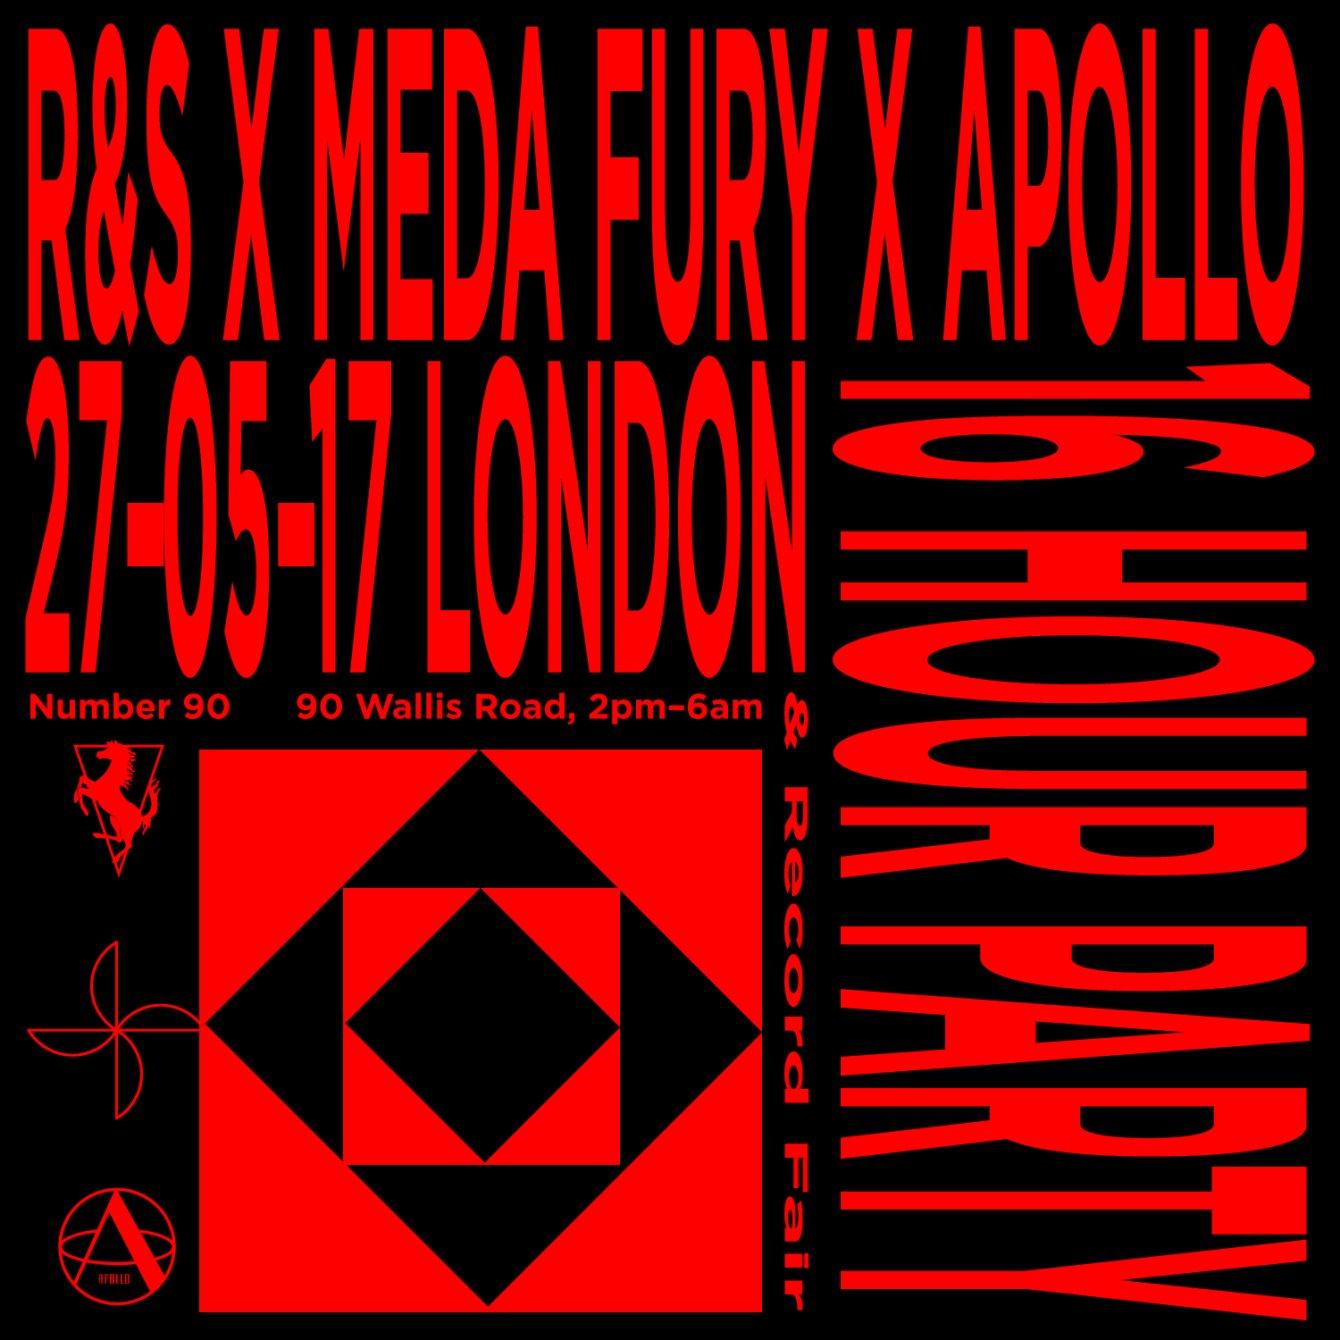 R&S Records x Meda Fury x Apollo: 16 Hour Party & Record Fair - Flyer front